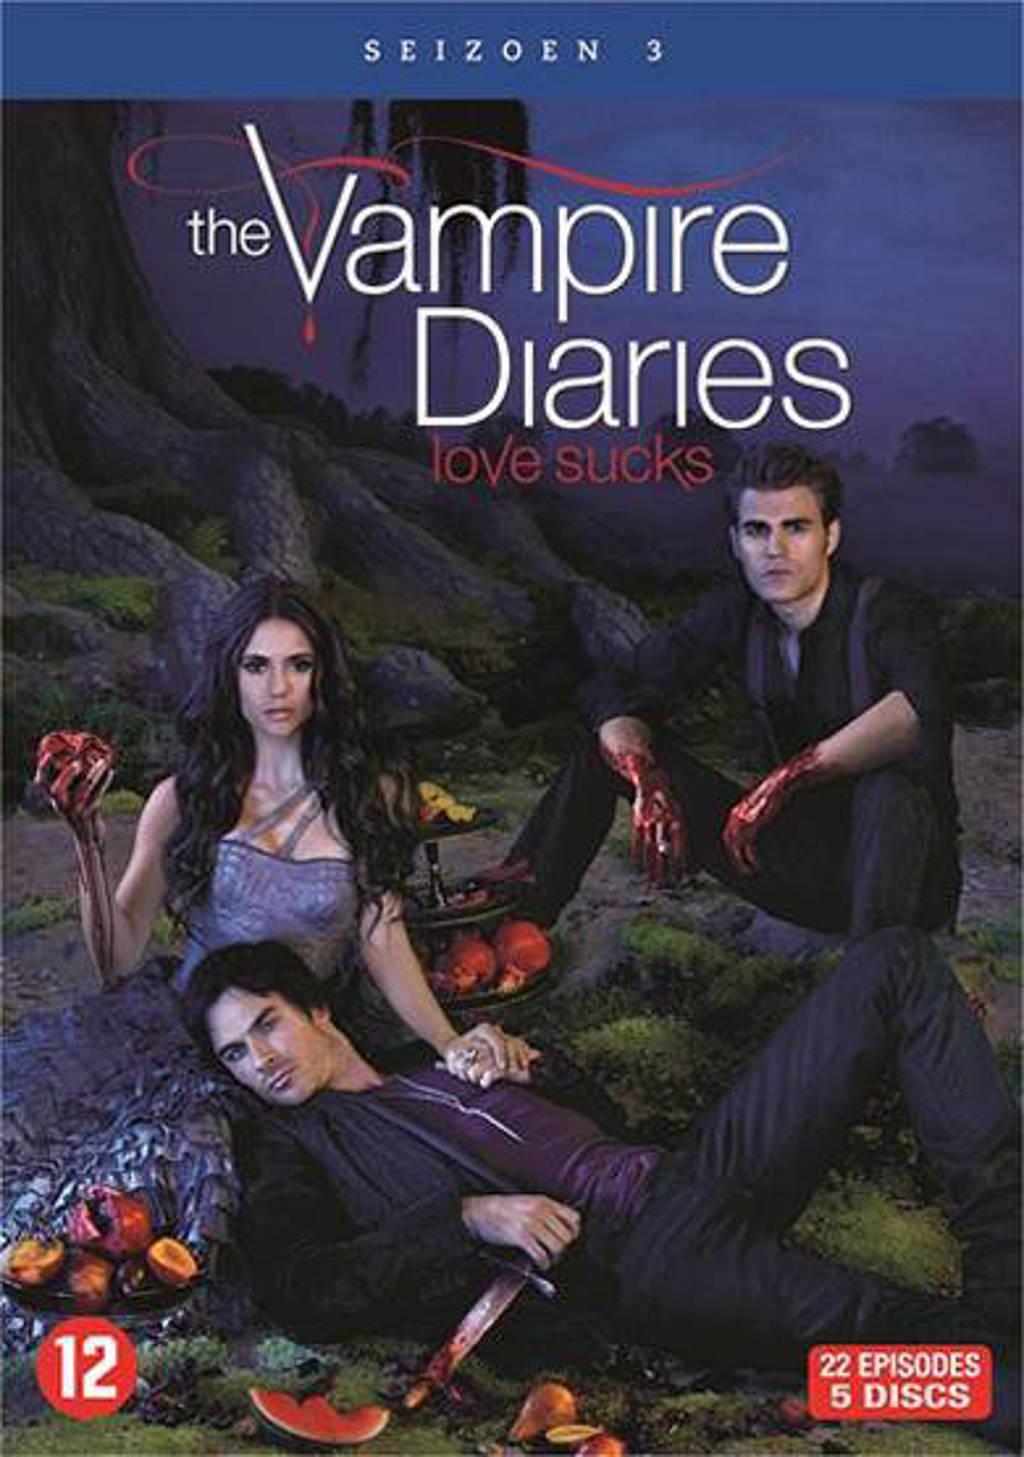 Vampire diaries - Seizoen 3 (DVD)